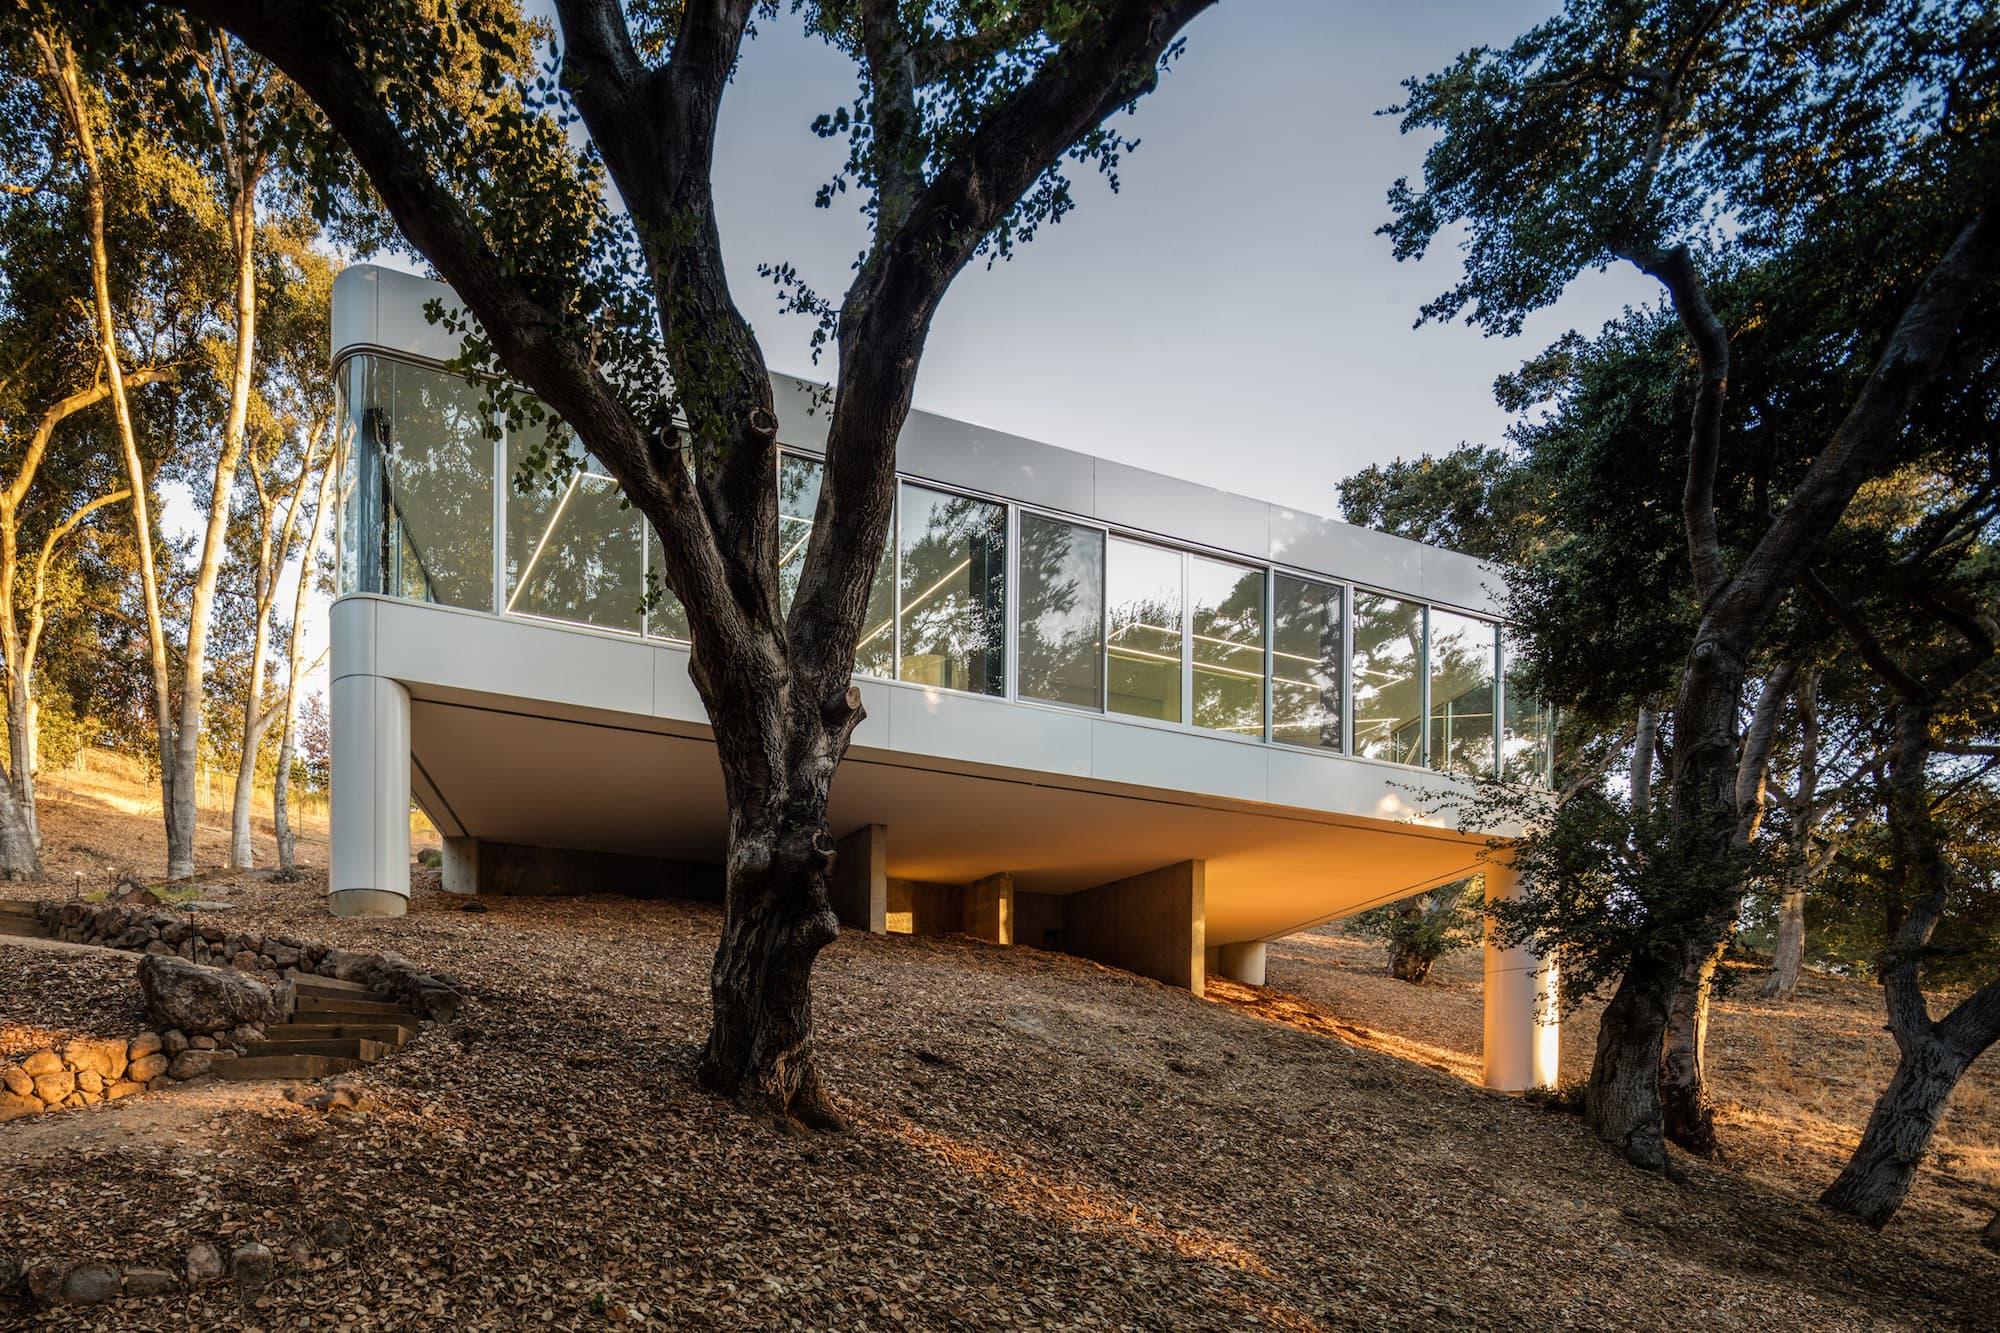 Licht ist Leben: Pam & Paul's House by Craig Steely Architecture 11